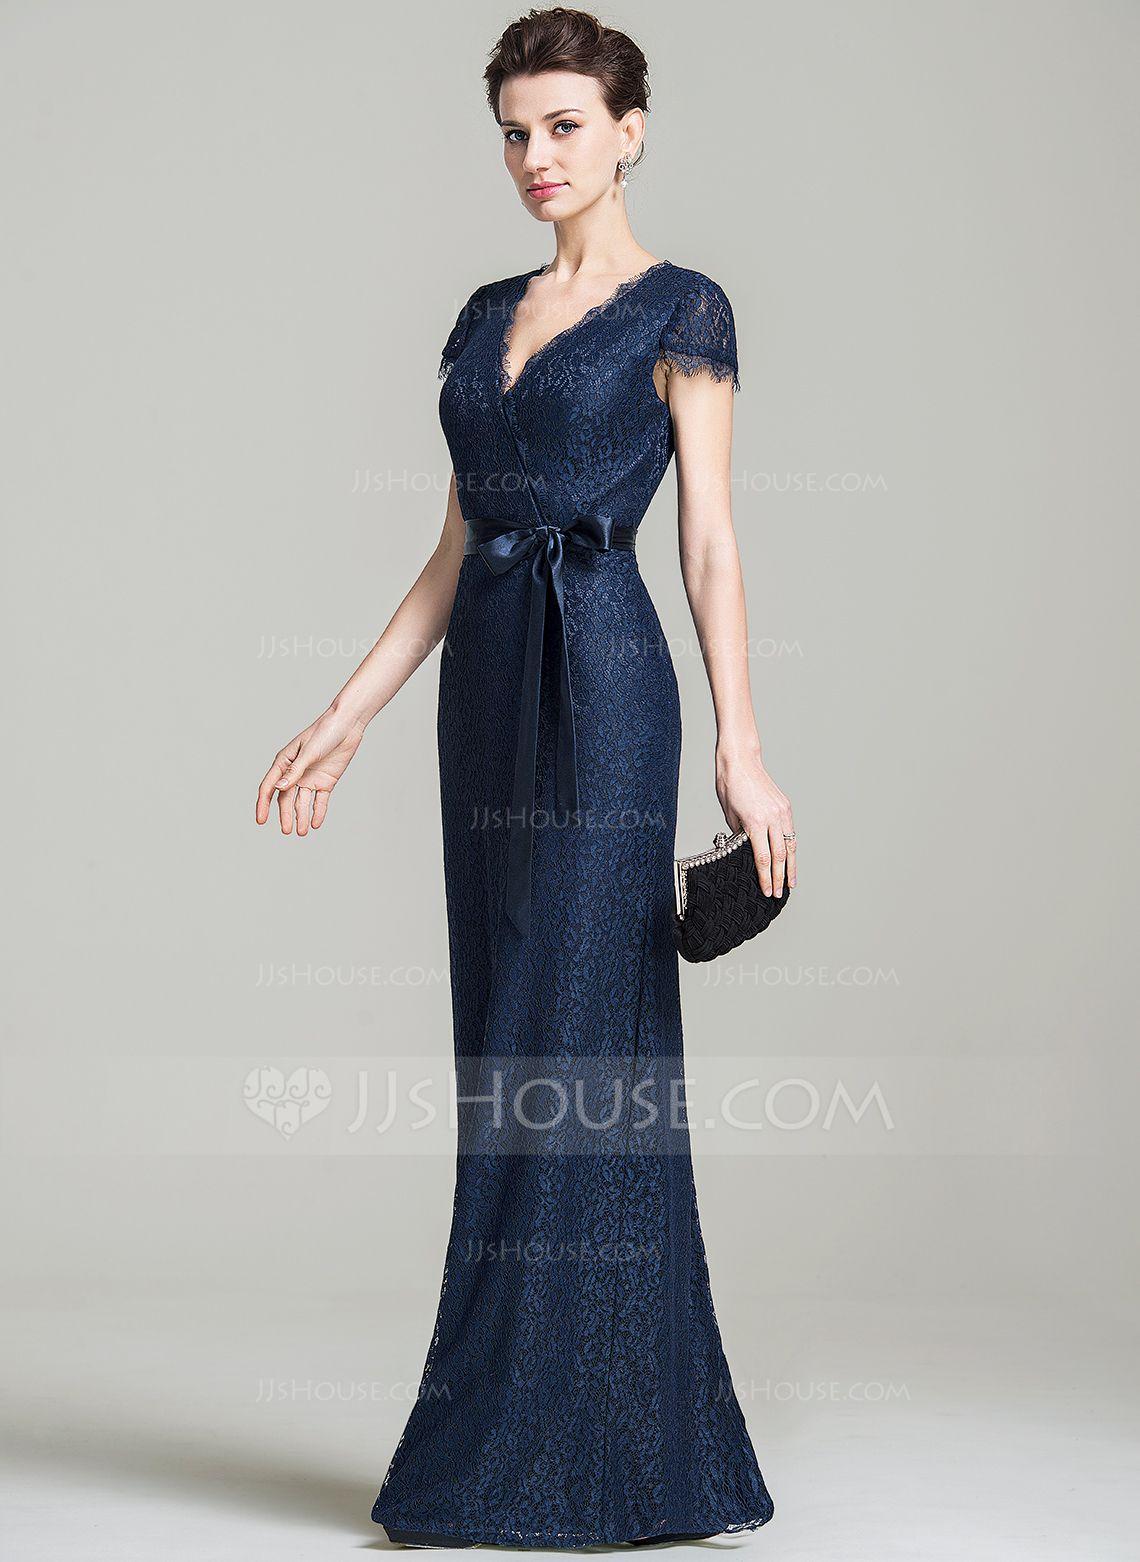 Jjshouse robe de la mere de la mariee